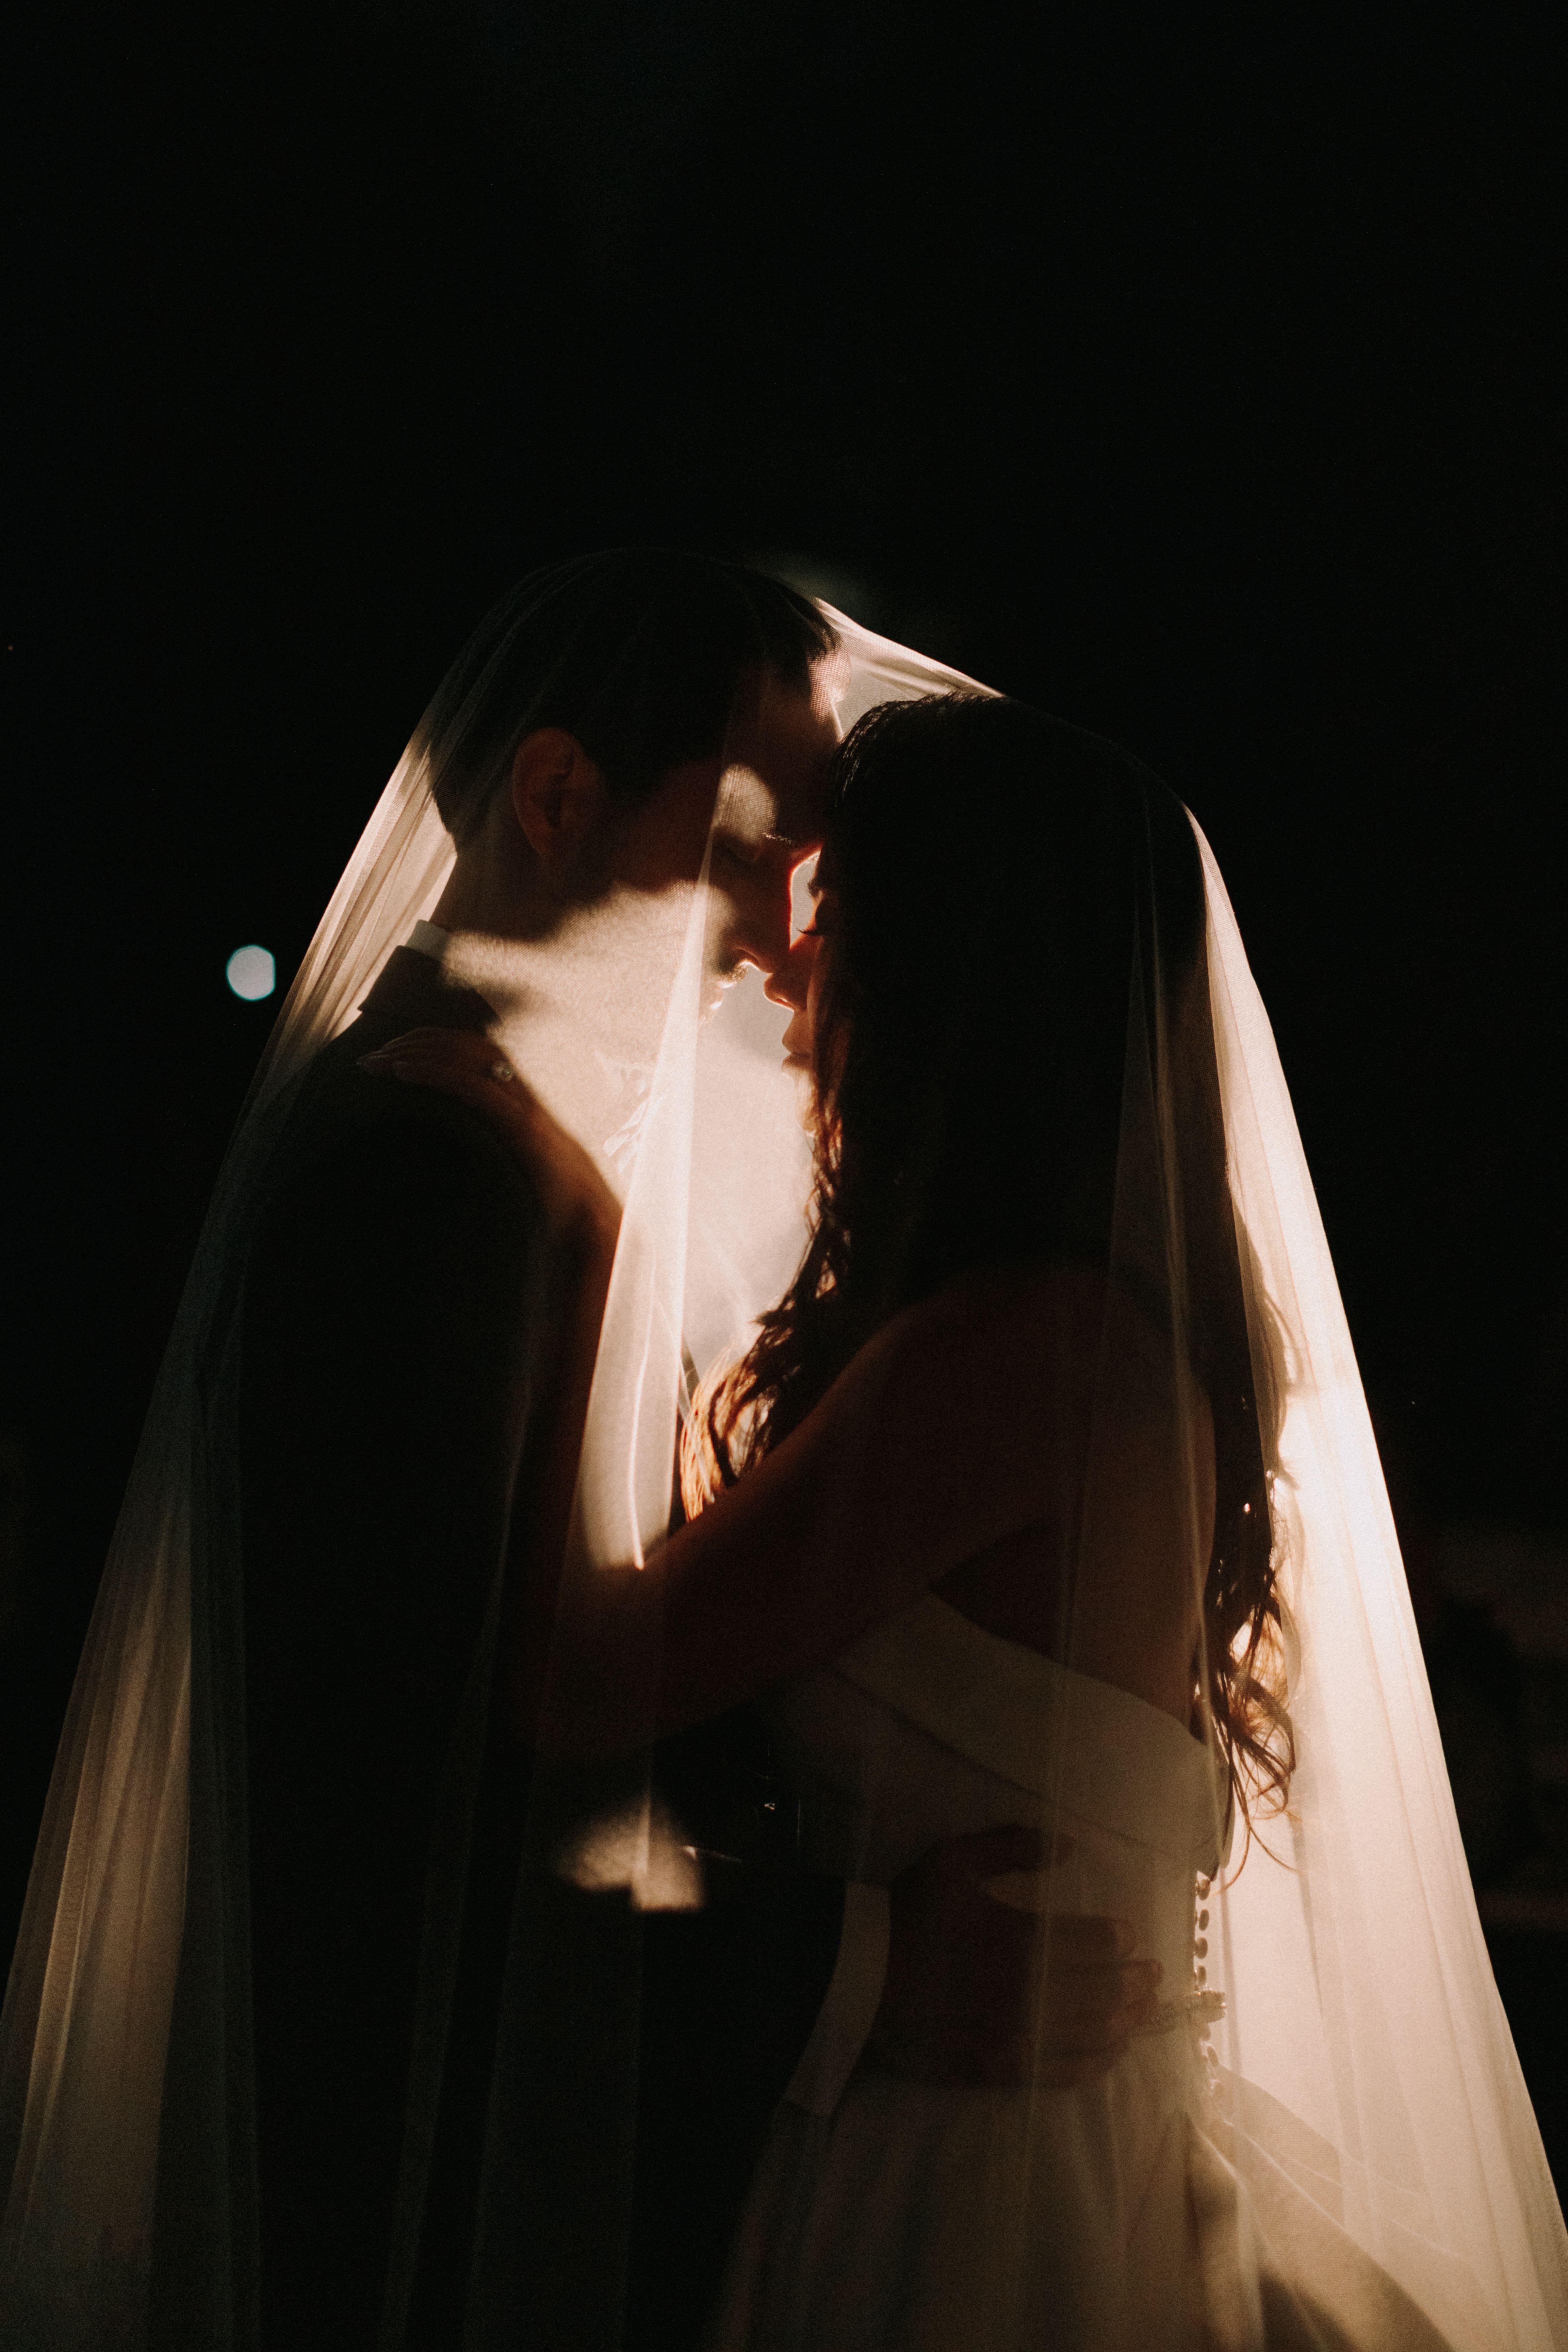 Trending 20 Must Have Night Wedding Photo Ideas Emmalovesweddings Night Wedding Photos Night Time Wedding Night Wedding Photography